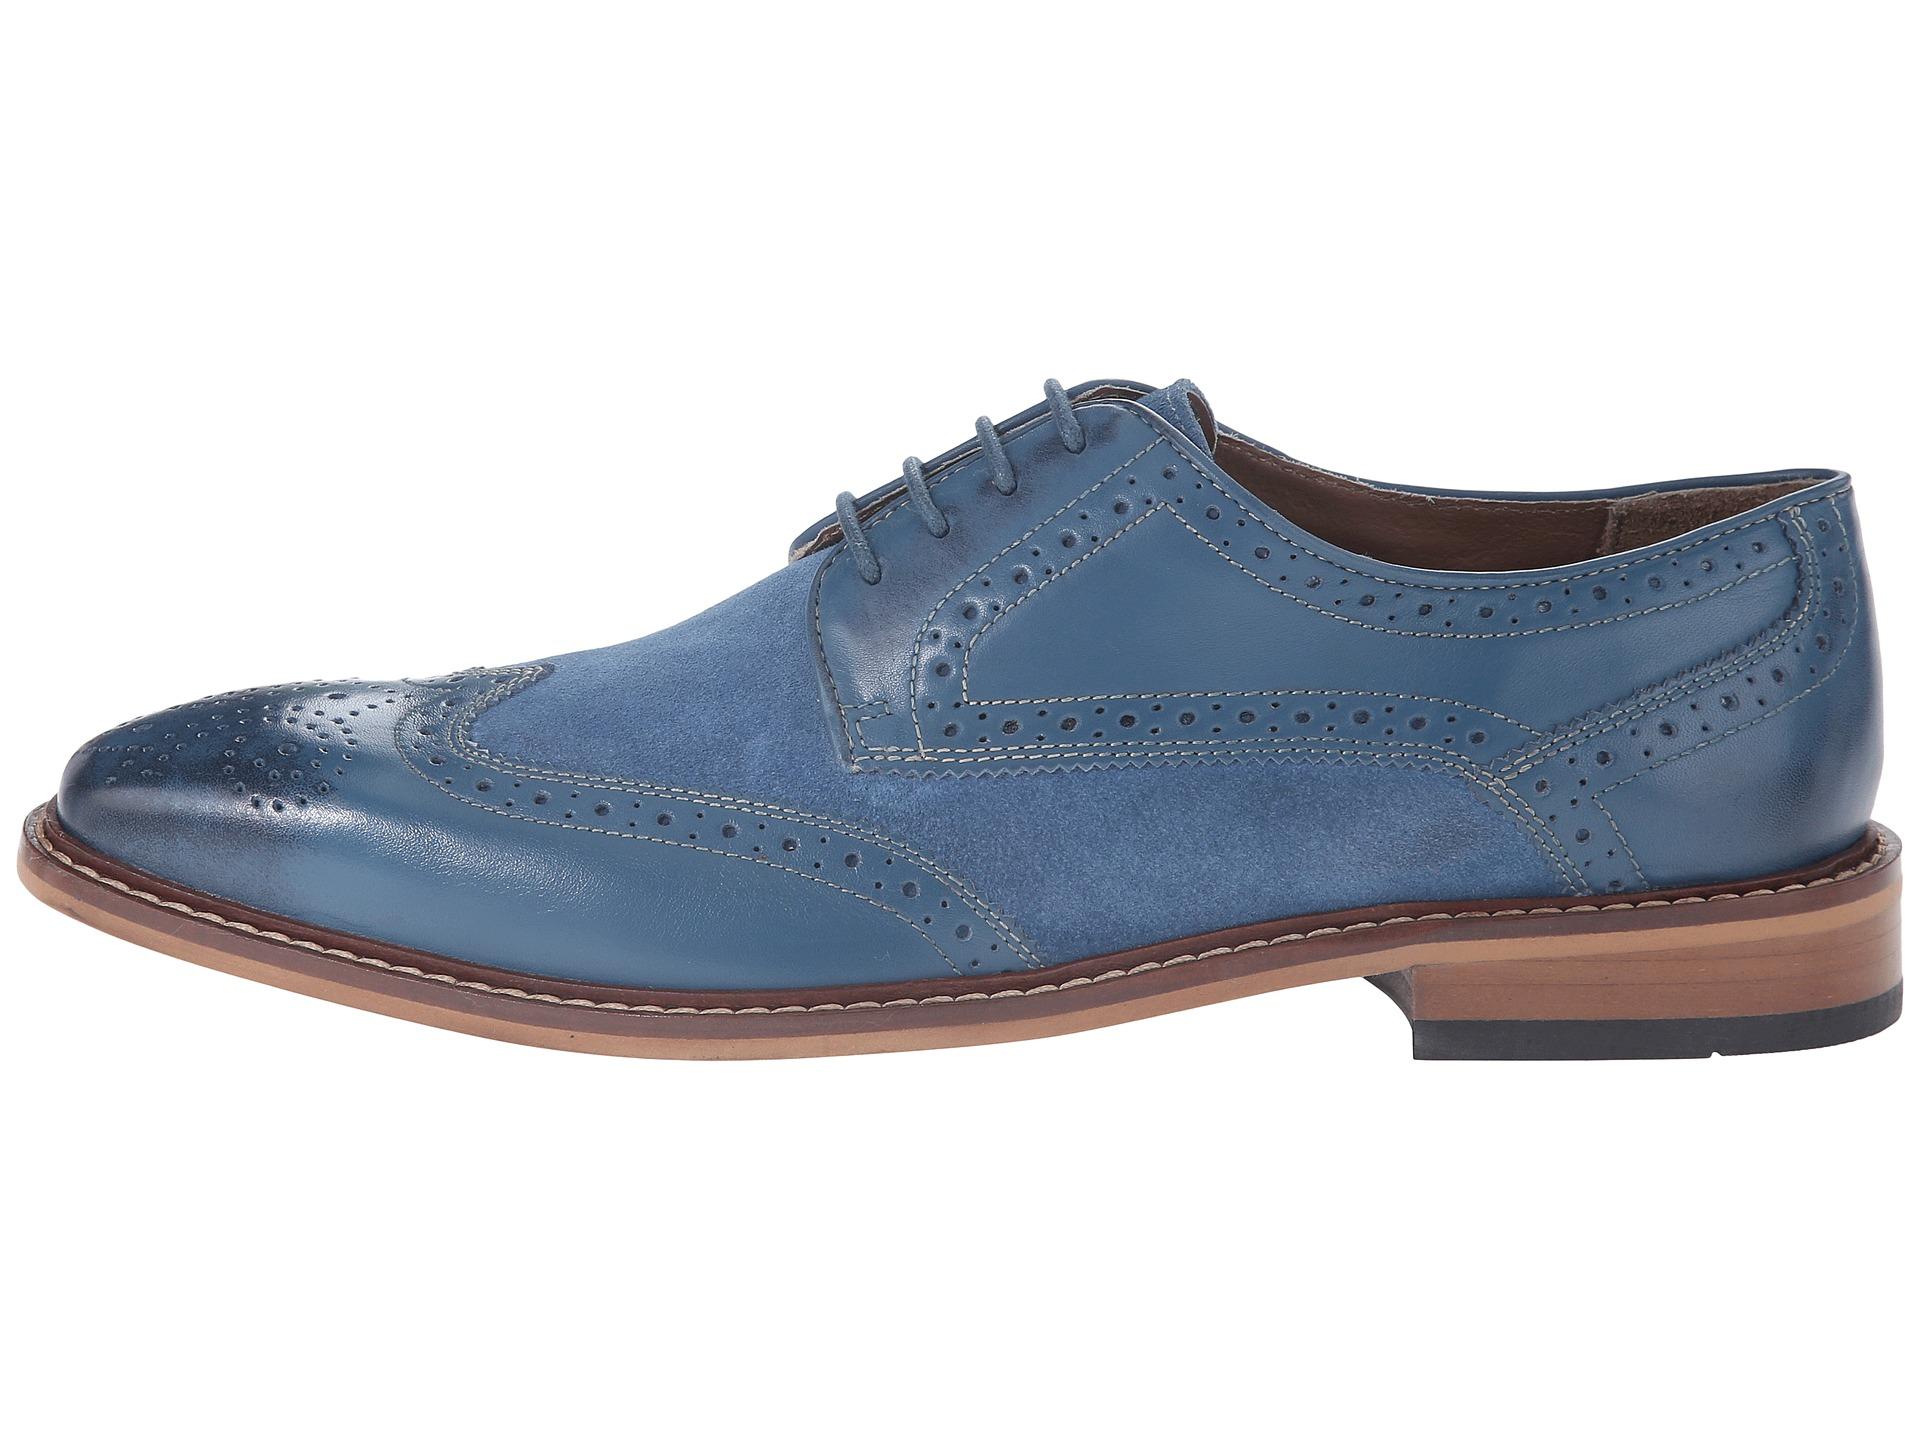 Giorgio Brutini Shoes For Sale